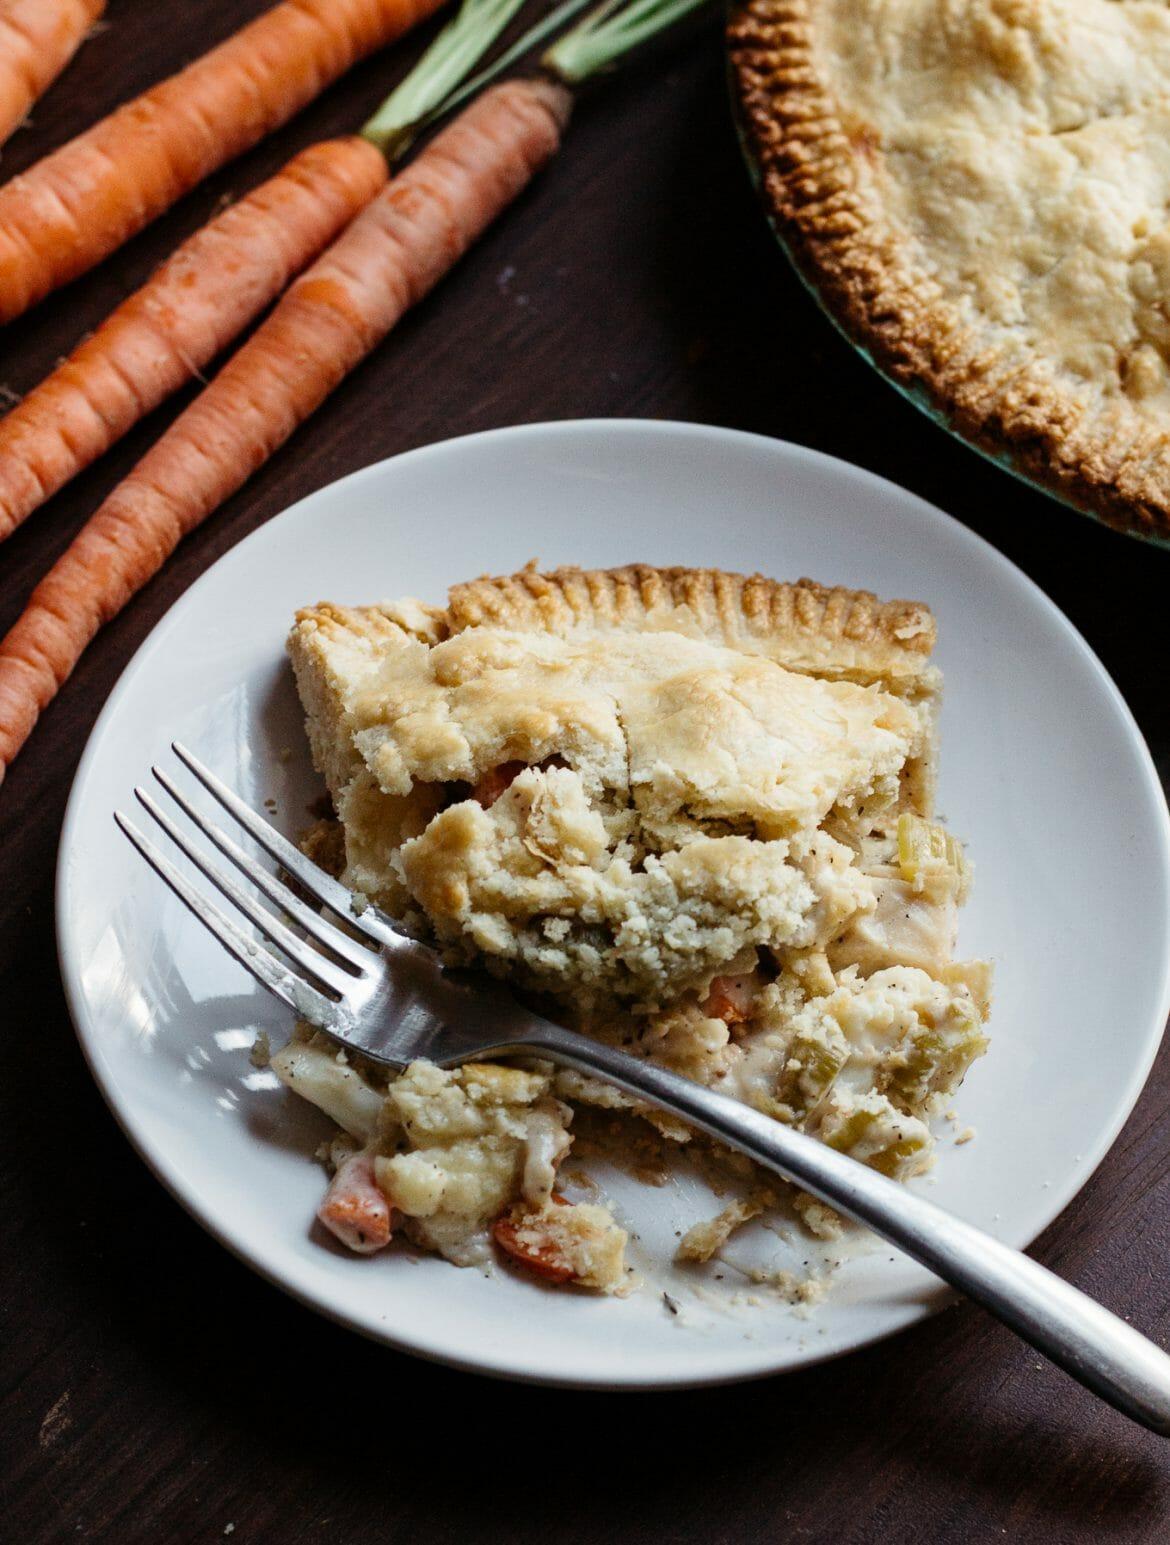 kraft recipe hub, walmart value shopping, chicken pot pie recipe, homemade pie crust, who to make a chicken pot pie